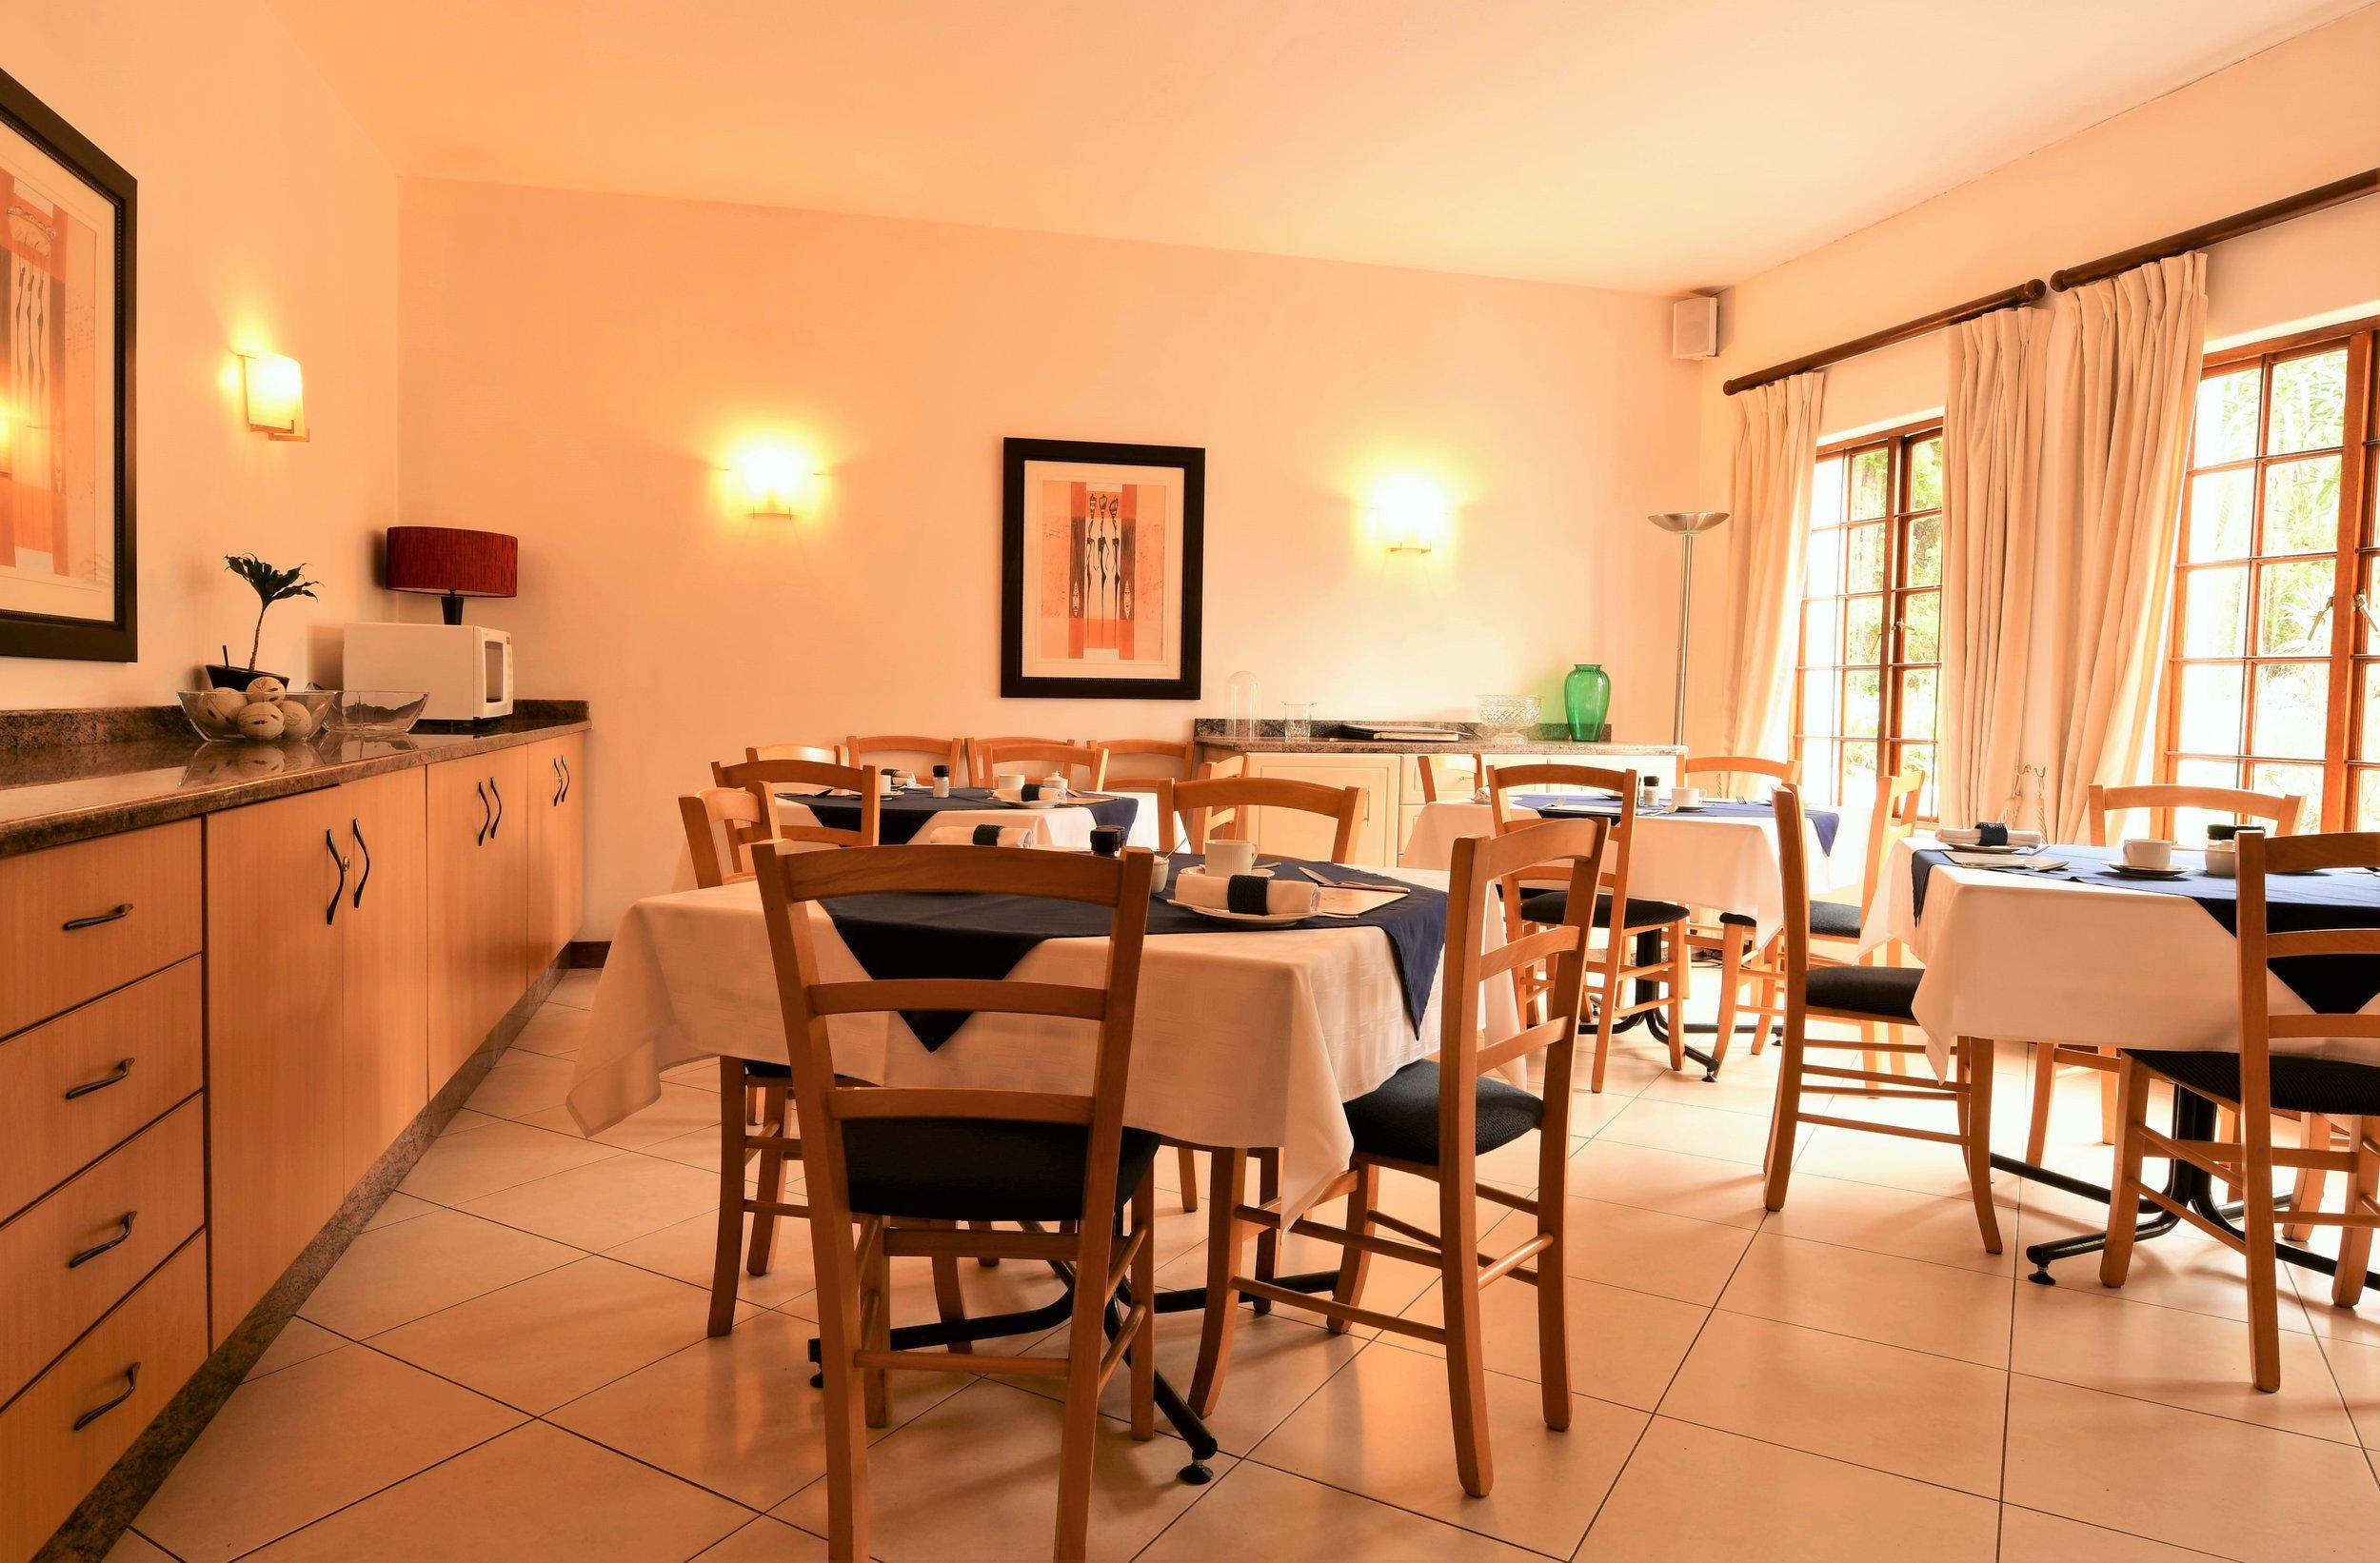 Highgrove dining room